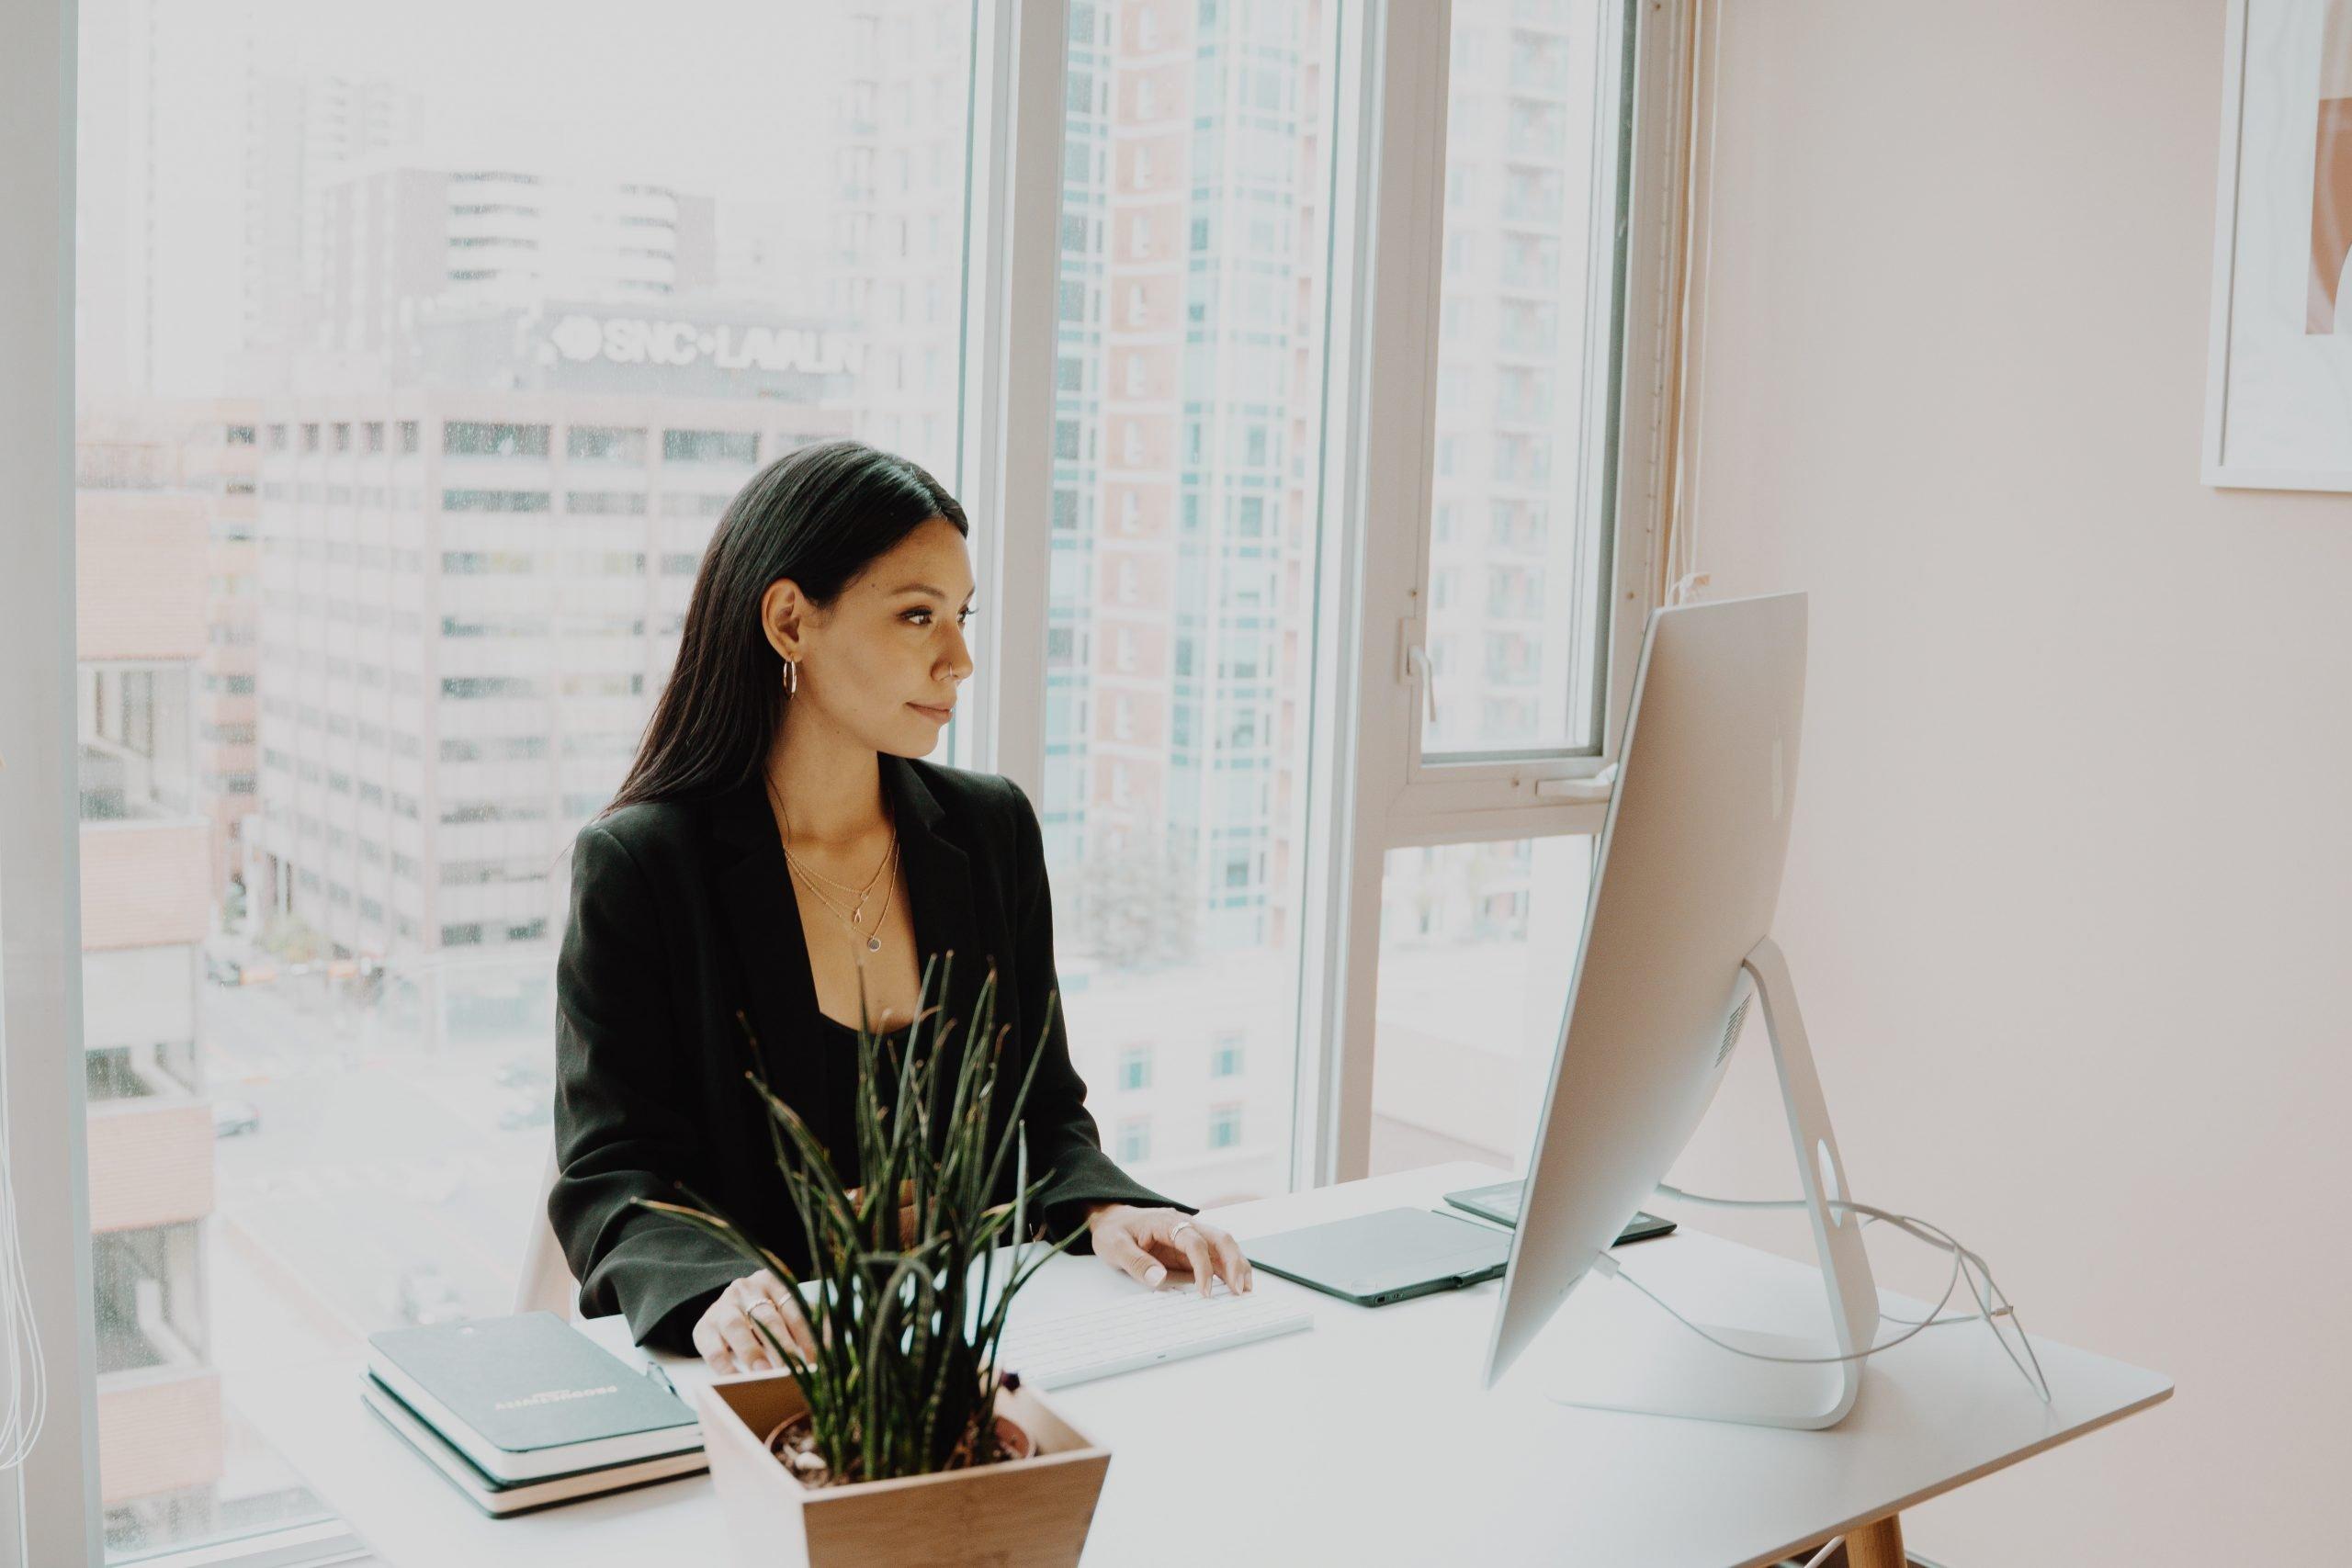 establish-your-expertise-coach-woman-at-desk